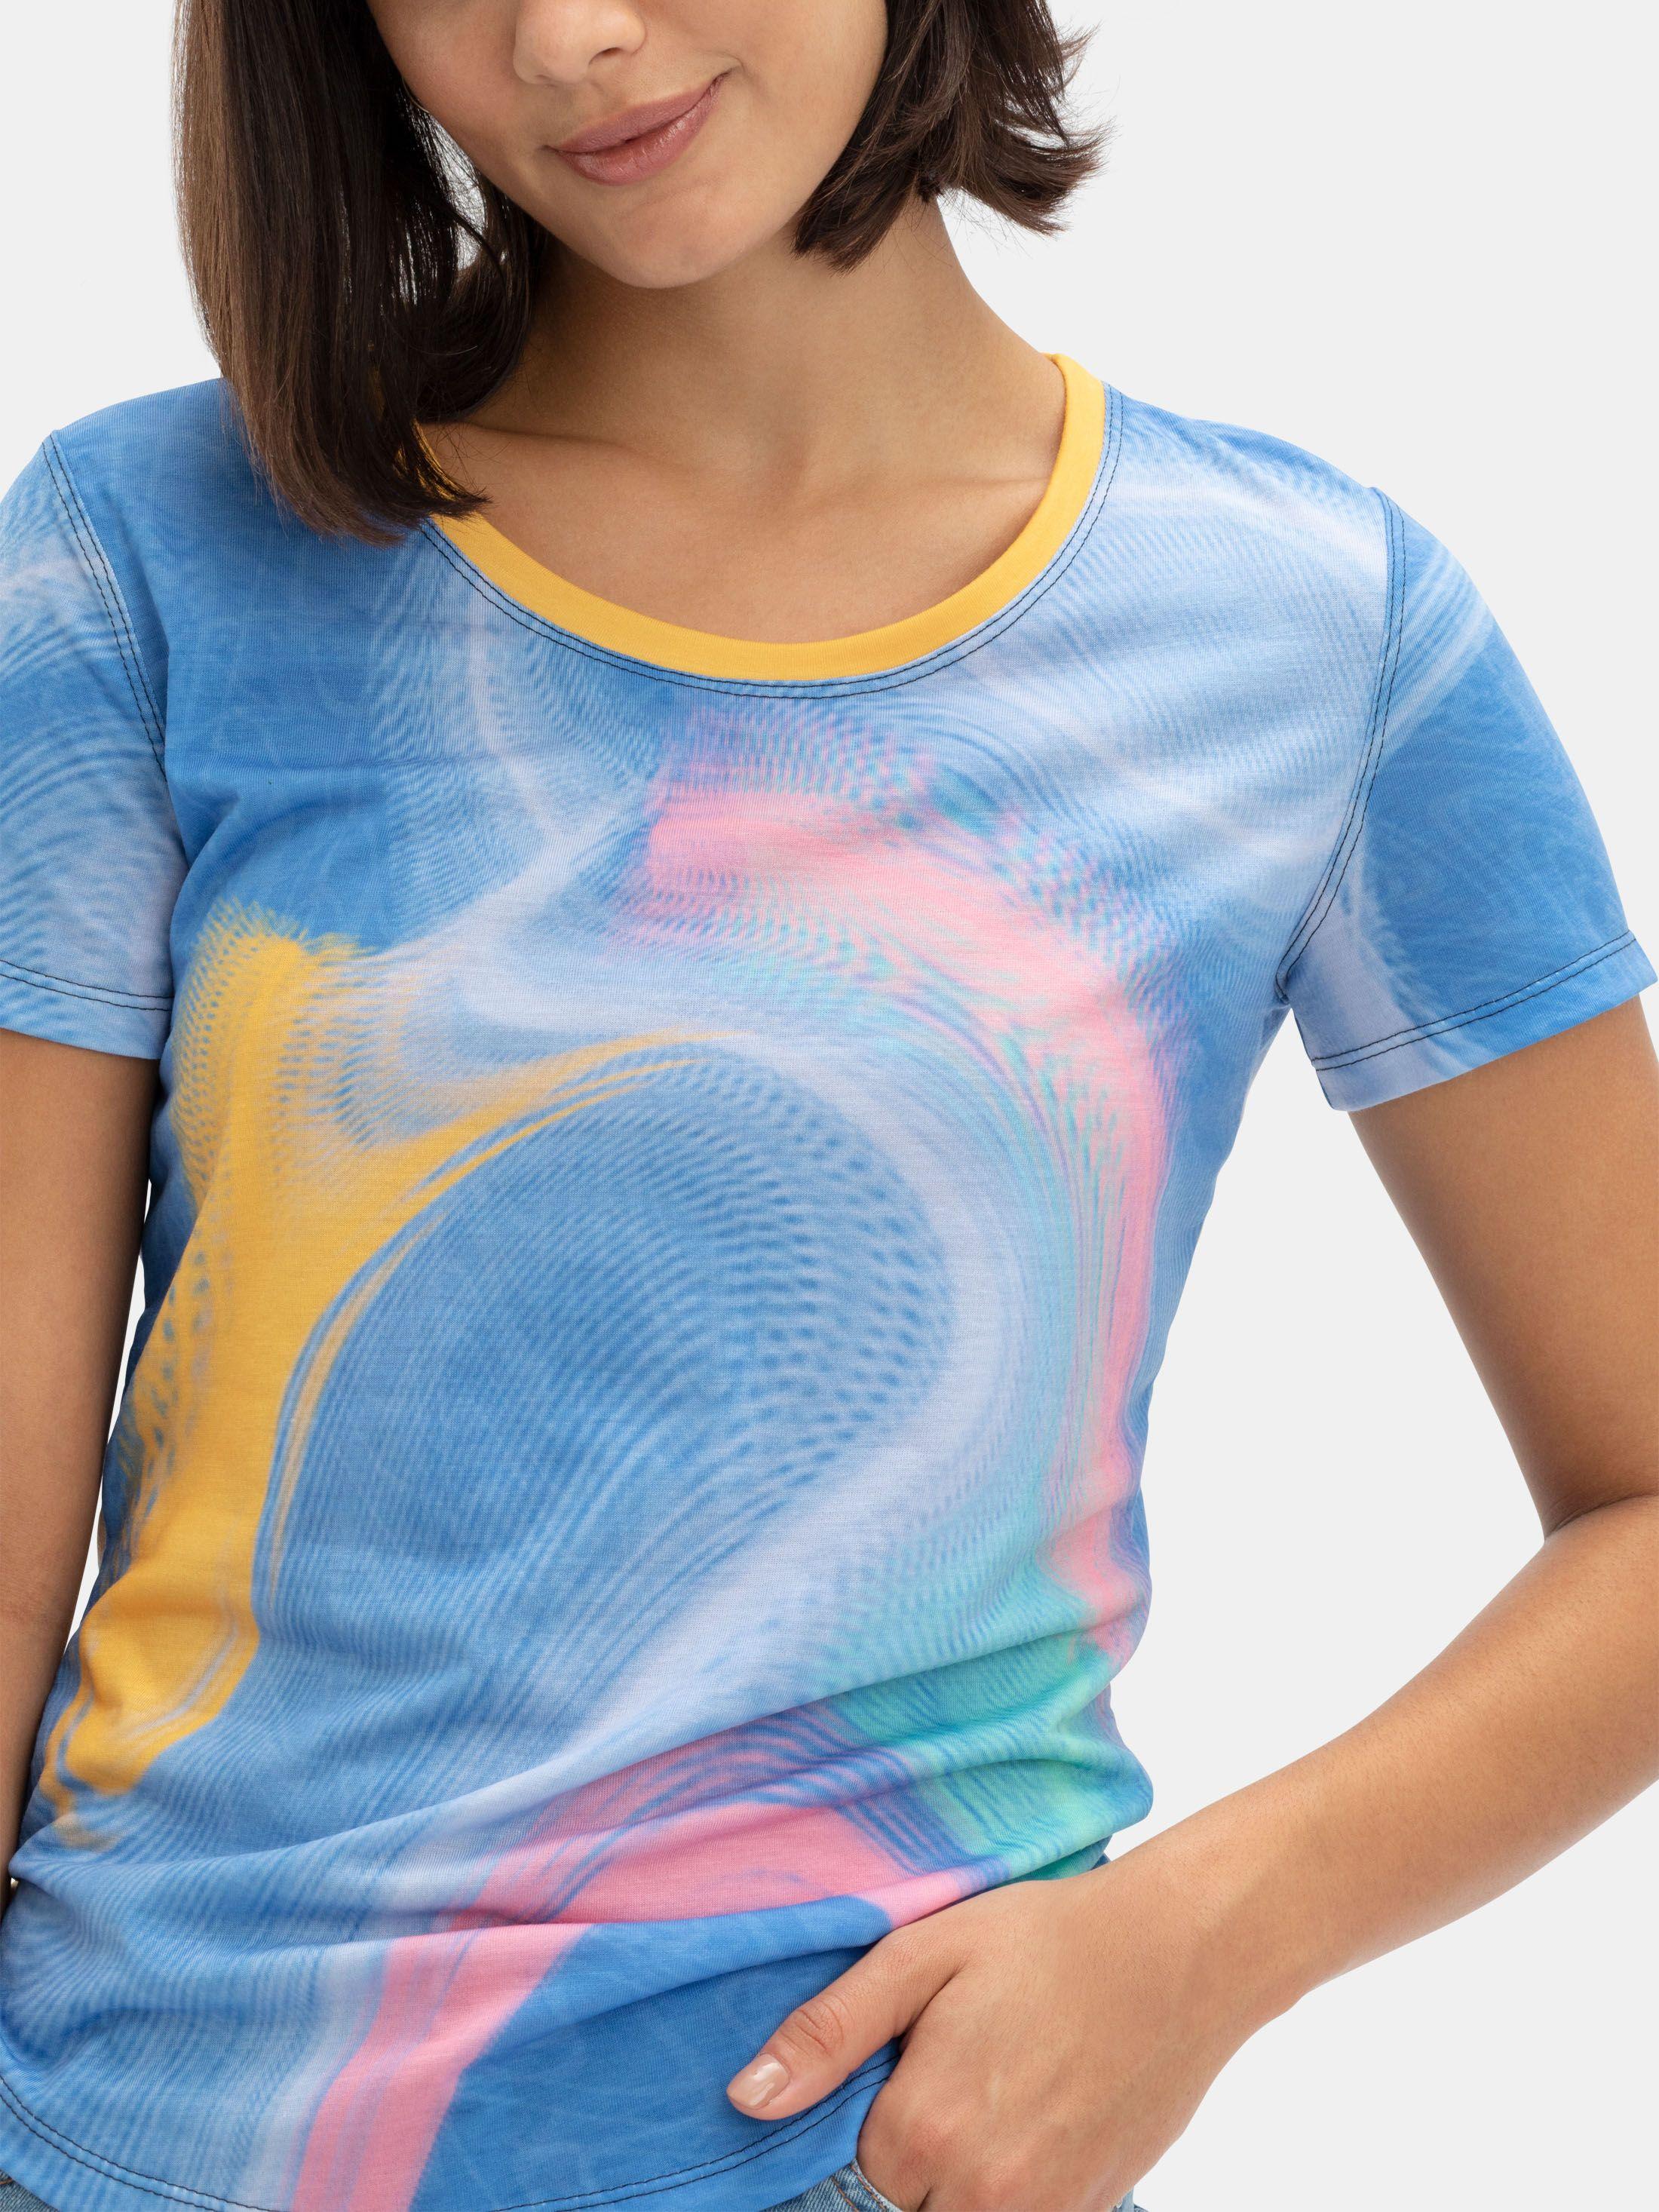 custom cotton t shirt printing